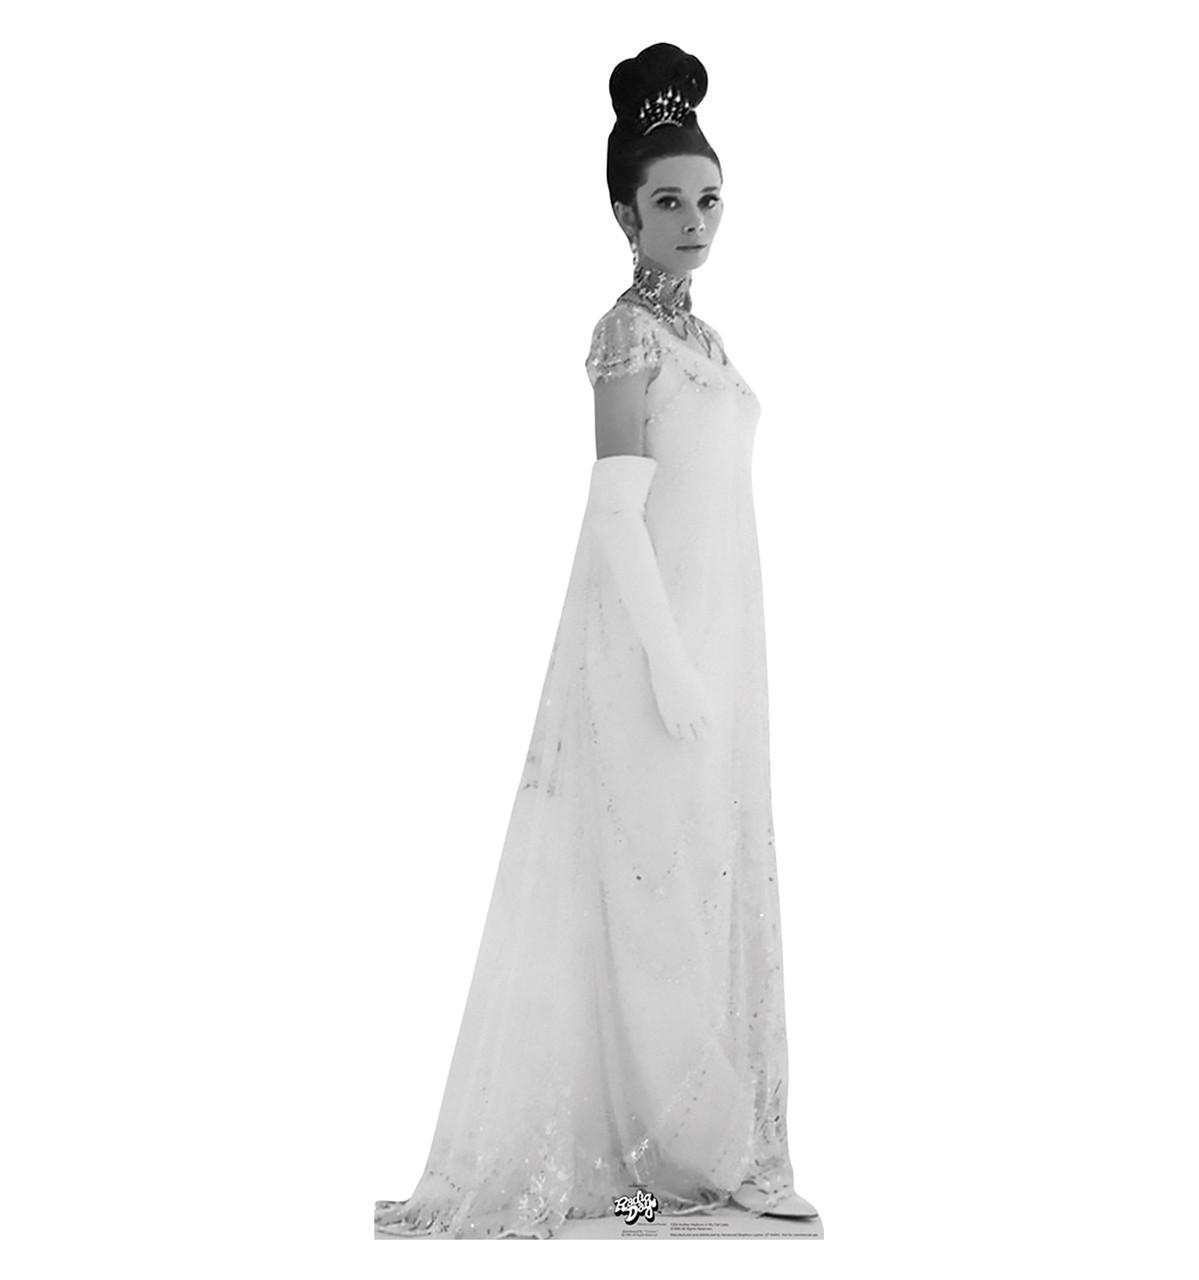 Life-size Audrey Hepburn in My Fair Lady Cardboard Standup ...